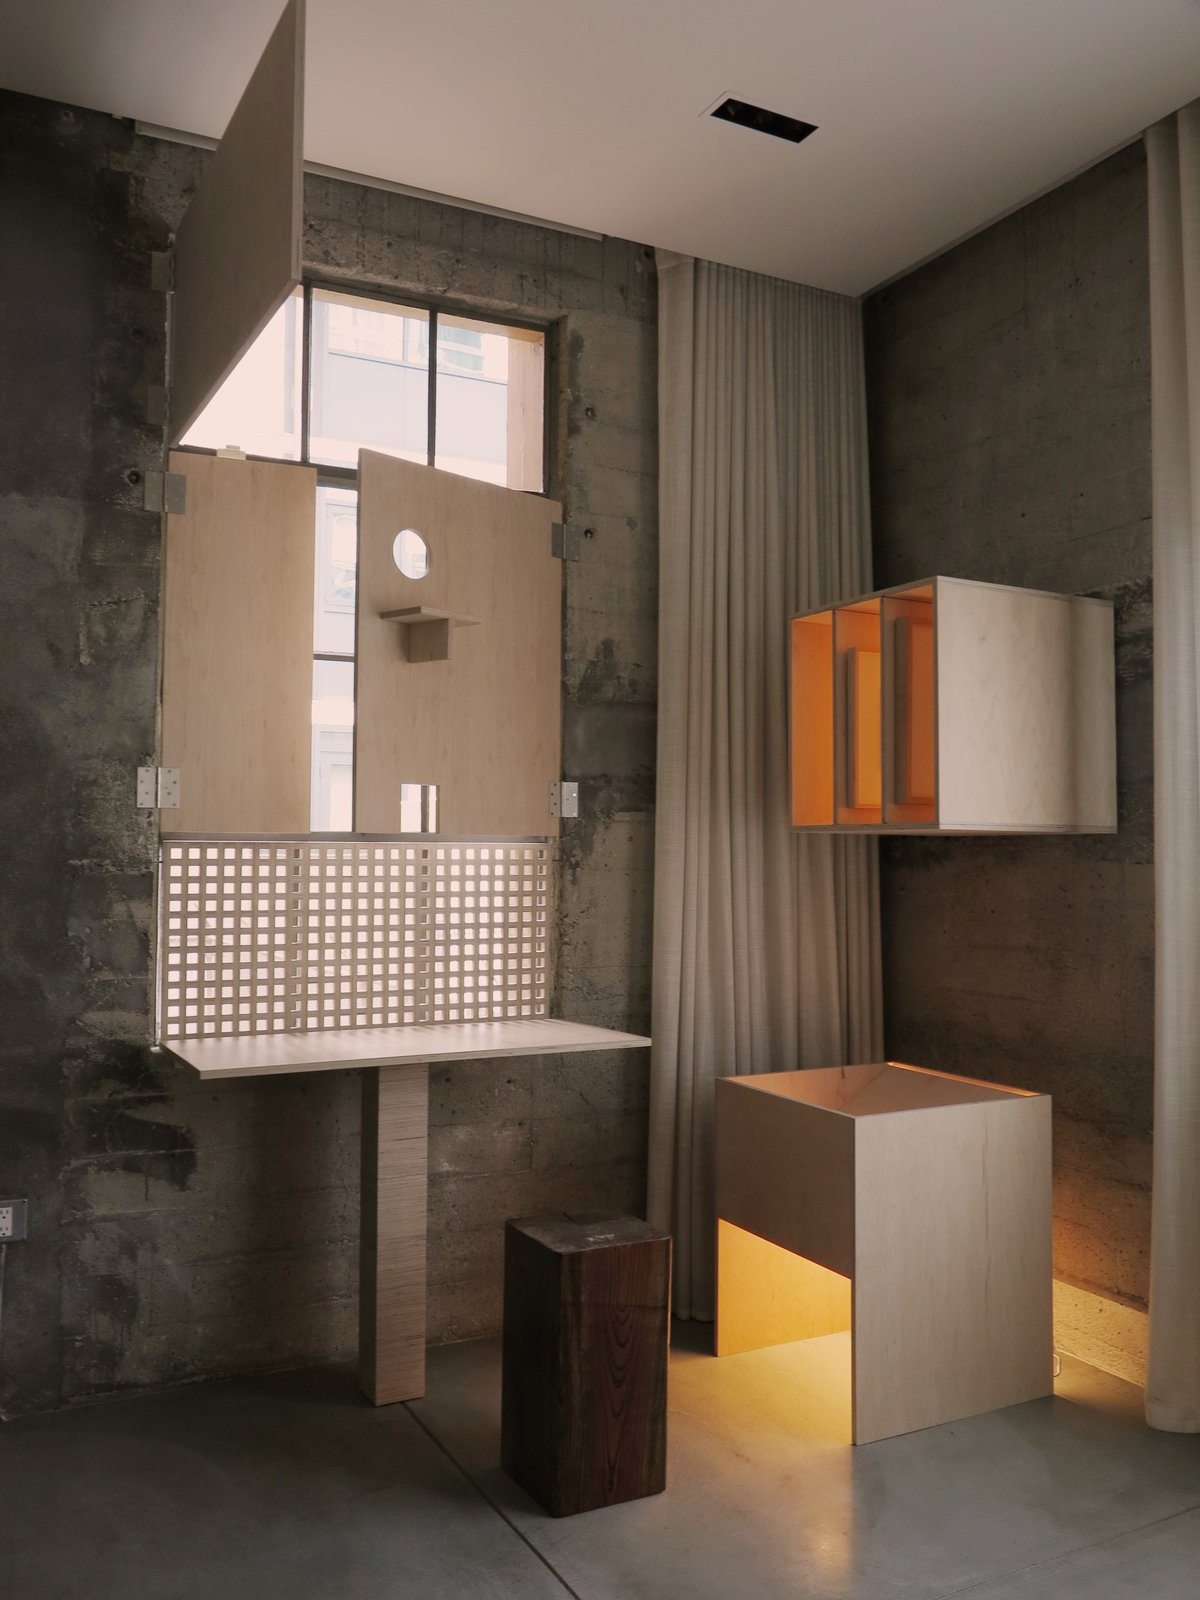 Francis Mill loft plywood owl corner and light box